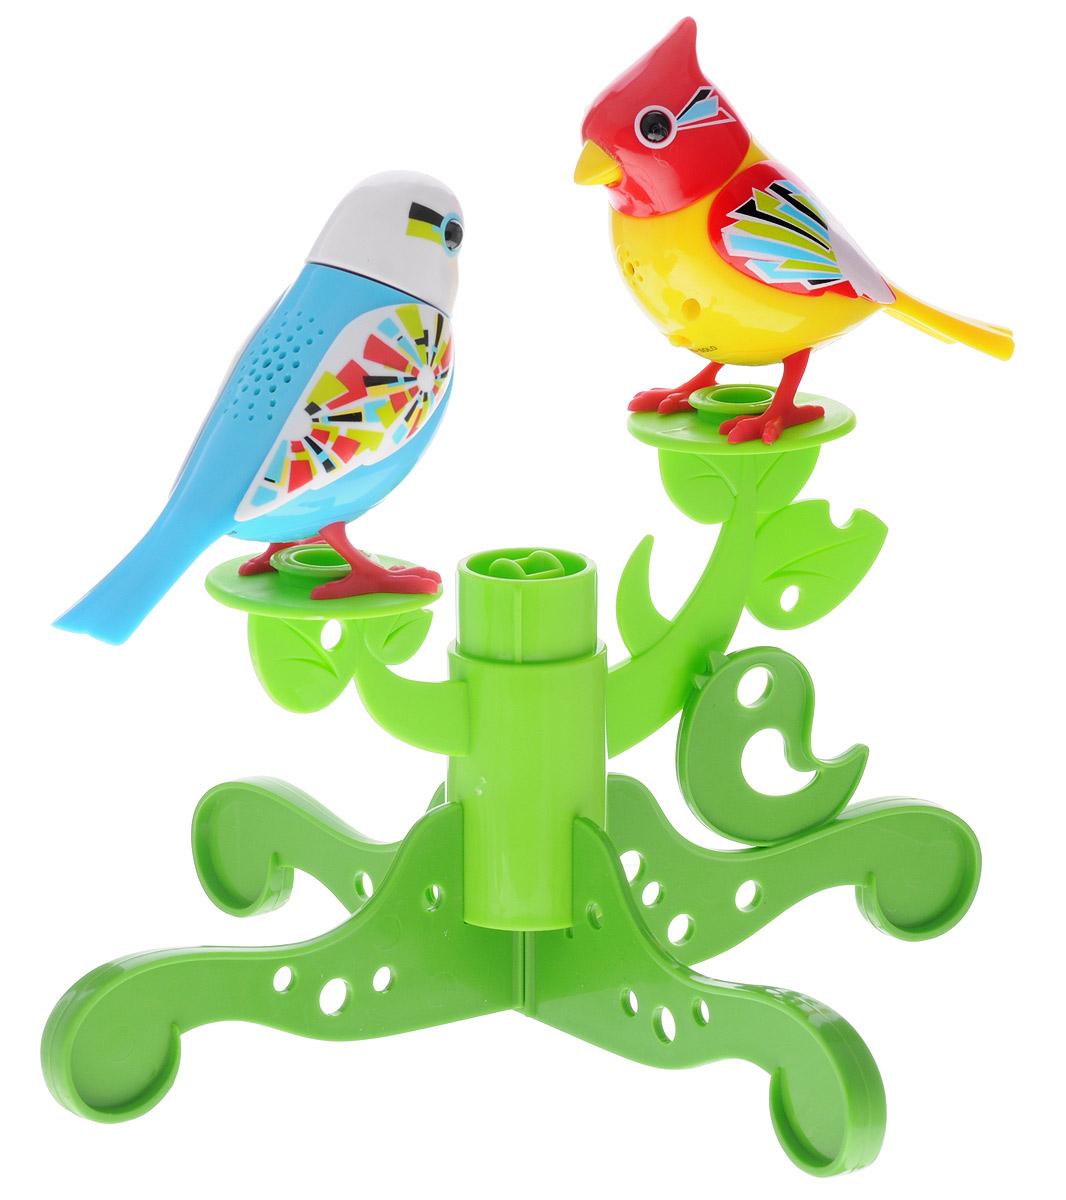 DigiFriends Интерактивная игрушка Две птички с деревом цвет голубой желтый